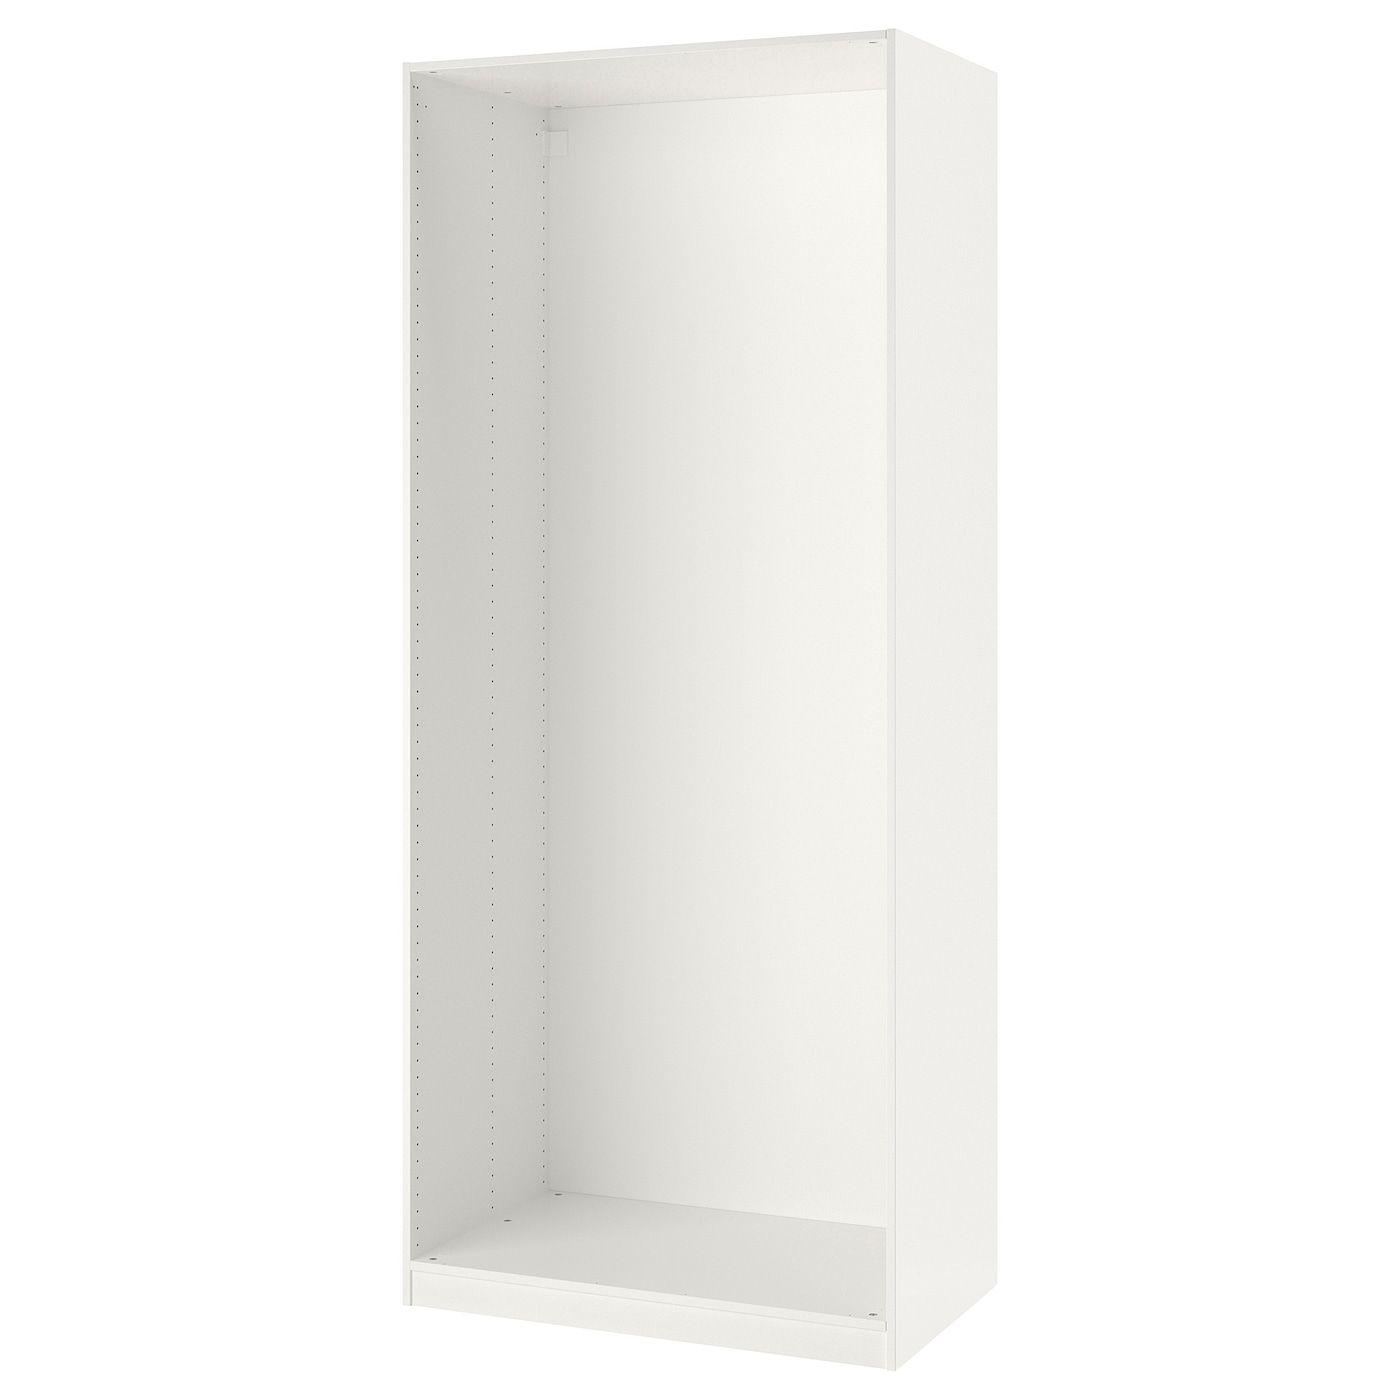 IKEA PAX White Wardrobe frame Ikea pax, Pax wardrobe